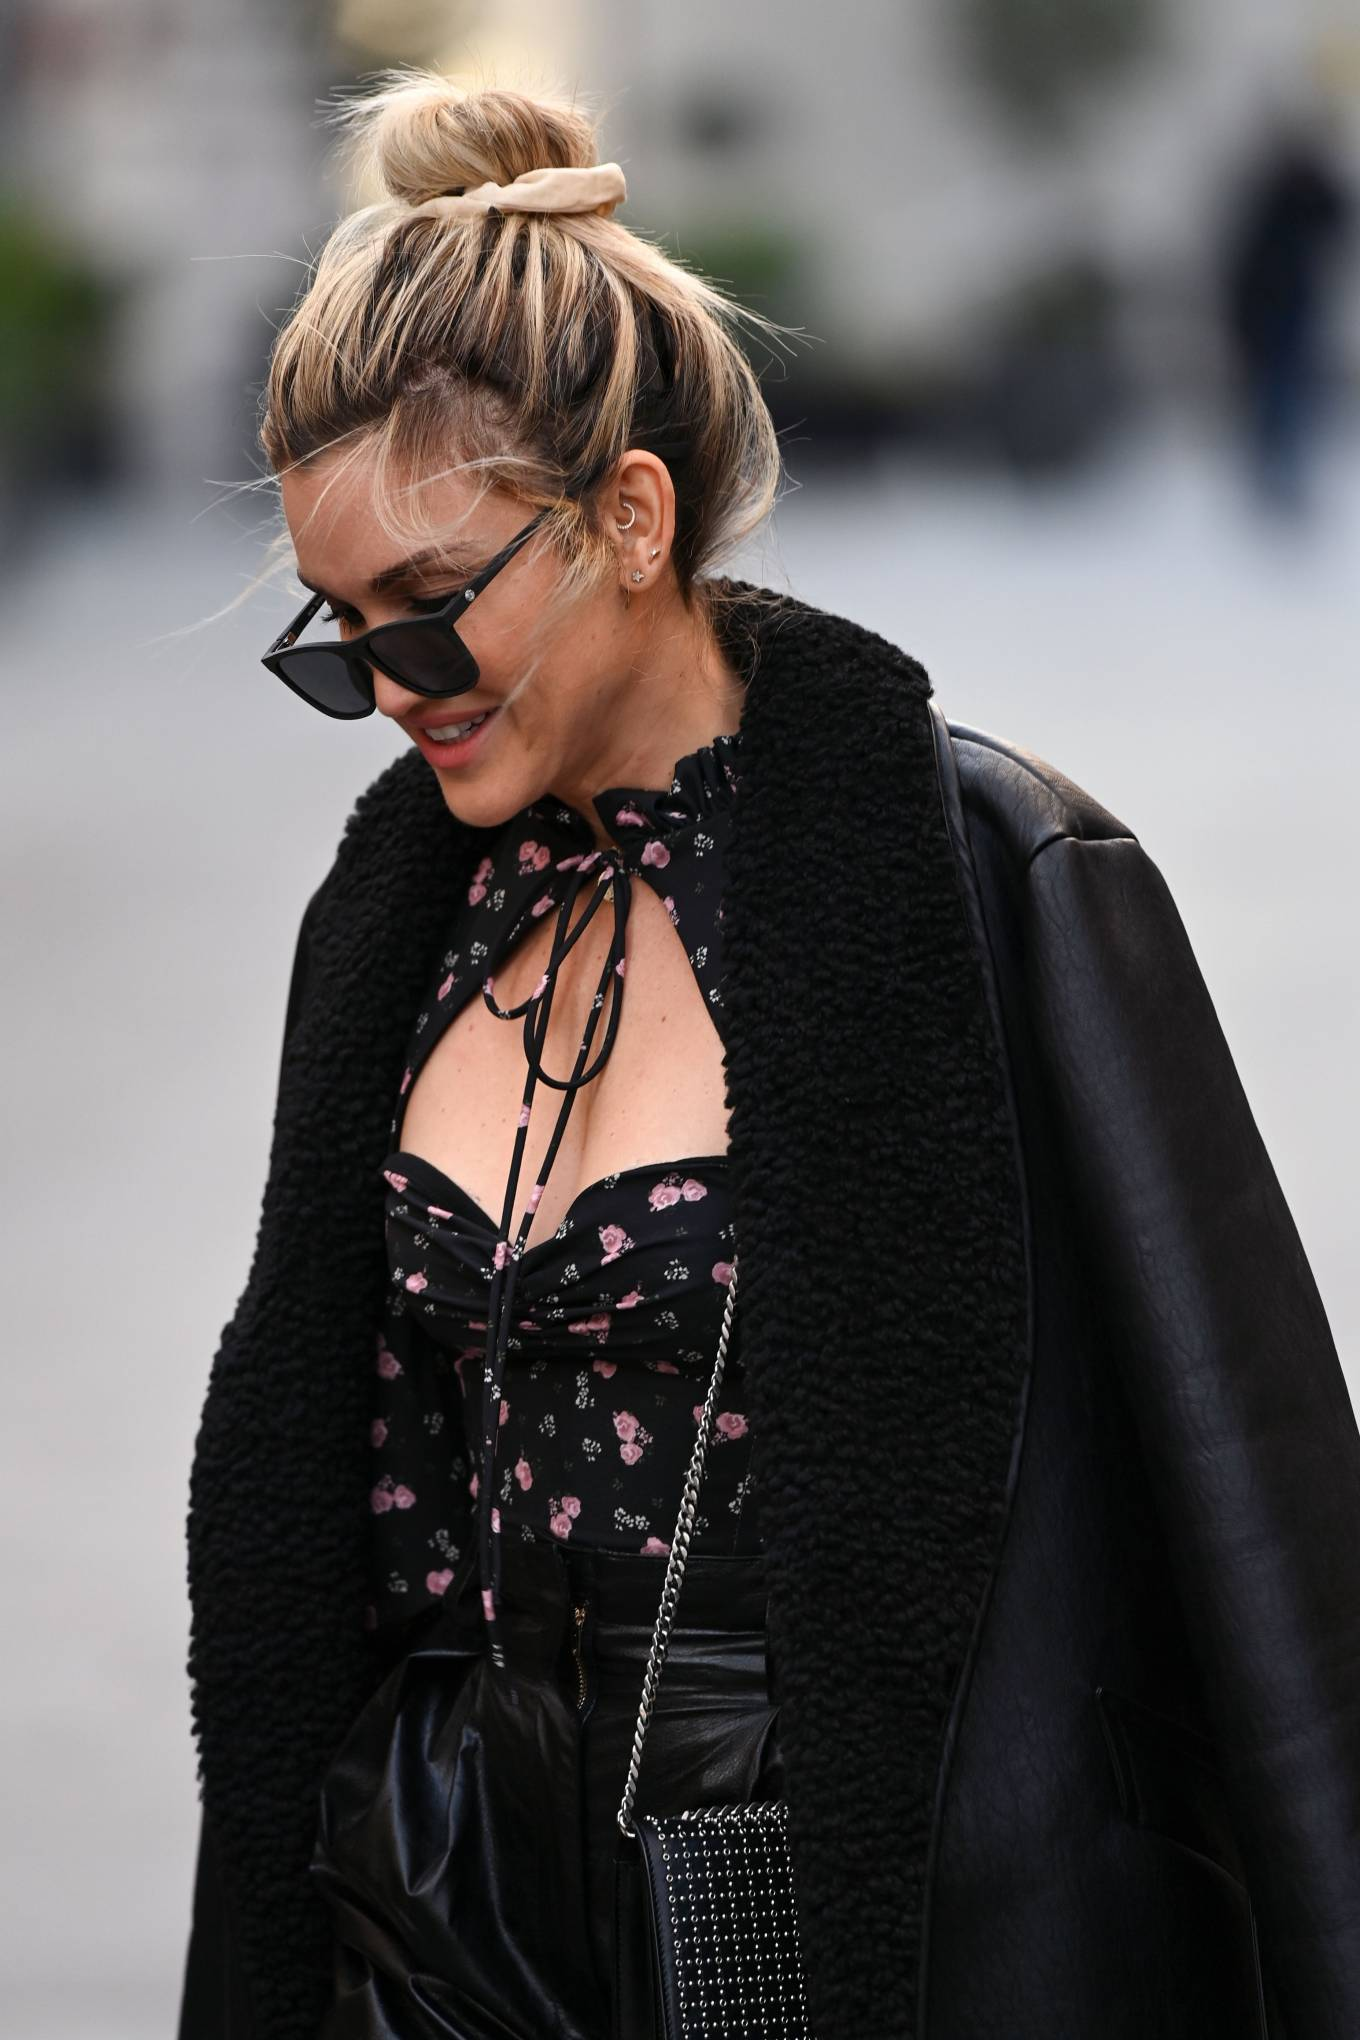 Ashley Roberts 2020 : Ashley Roberts – Looks chic leaving the Global Radio Studios in London-15